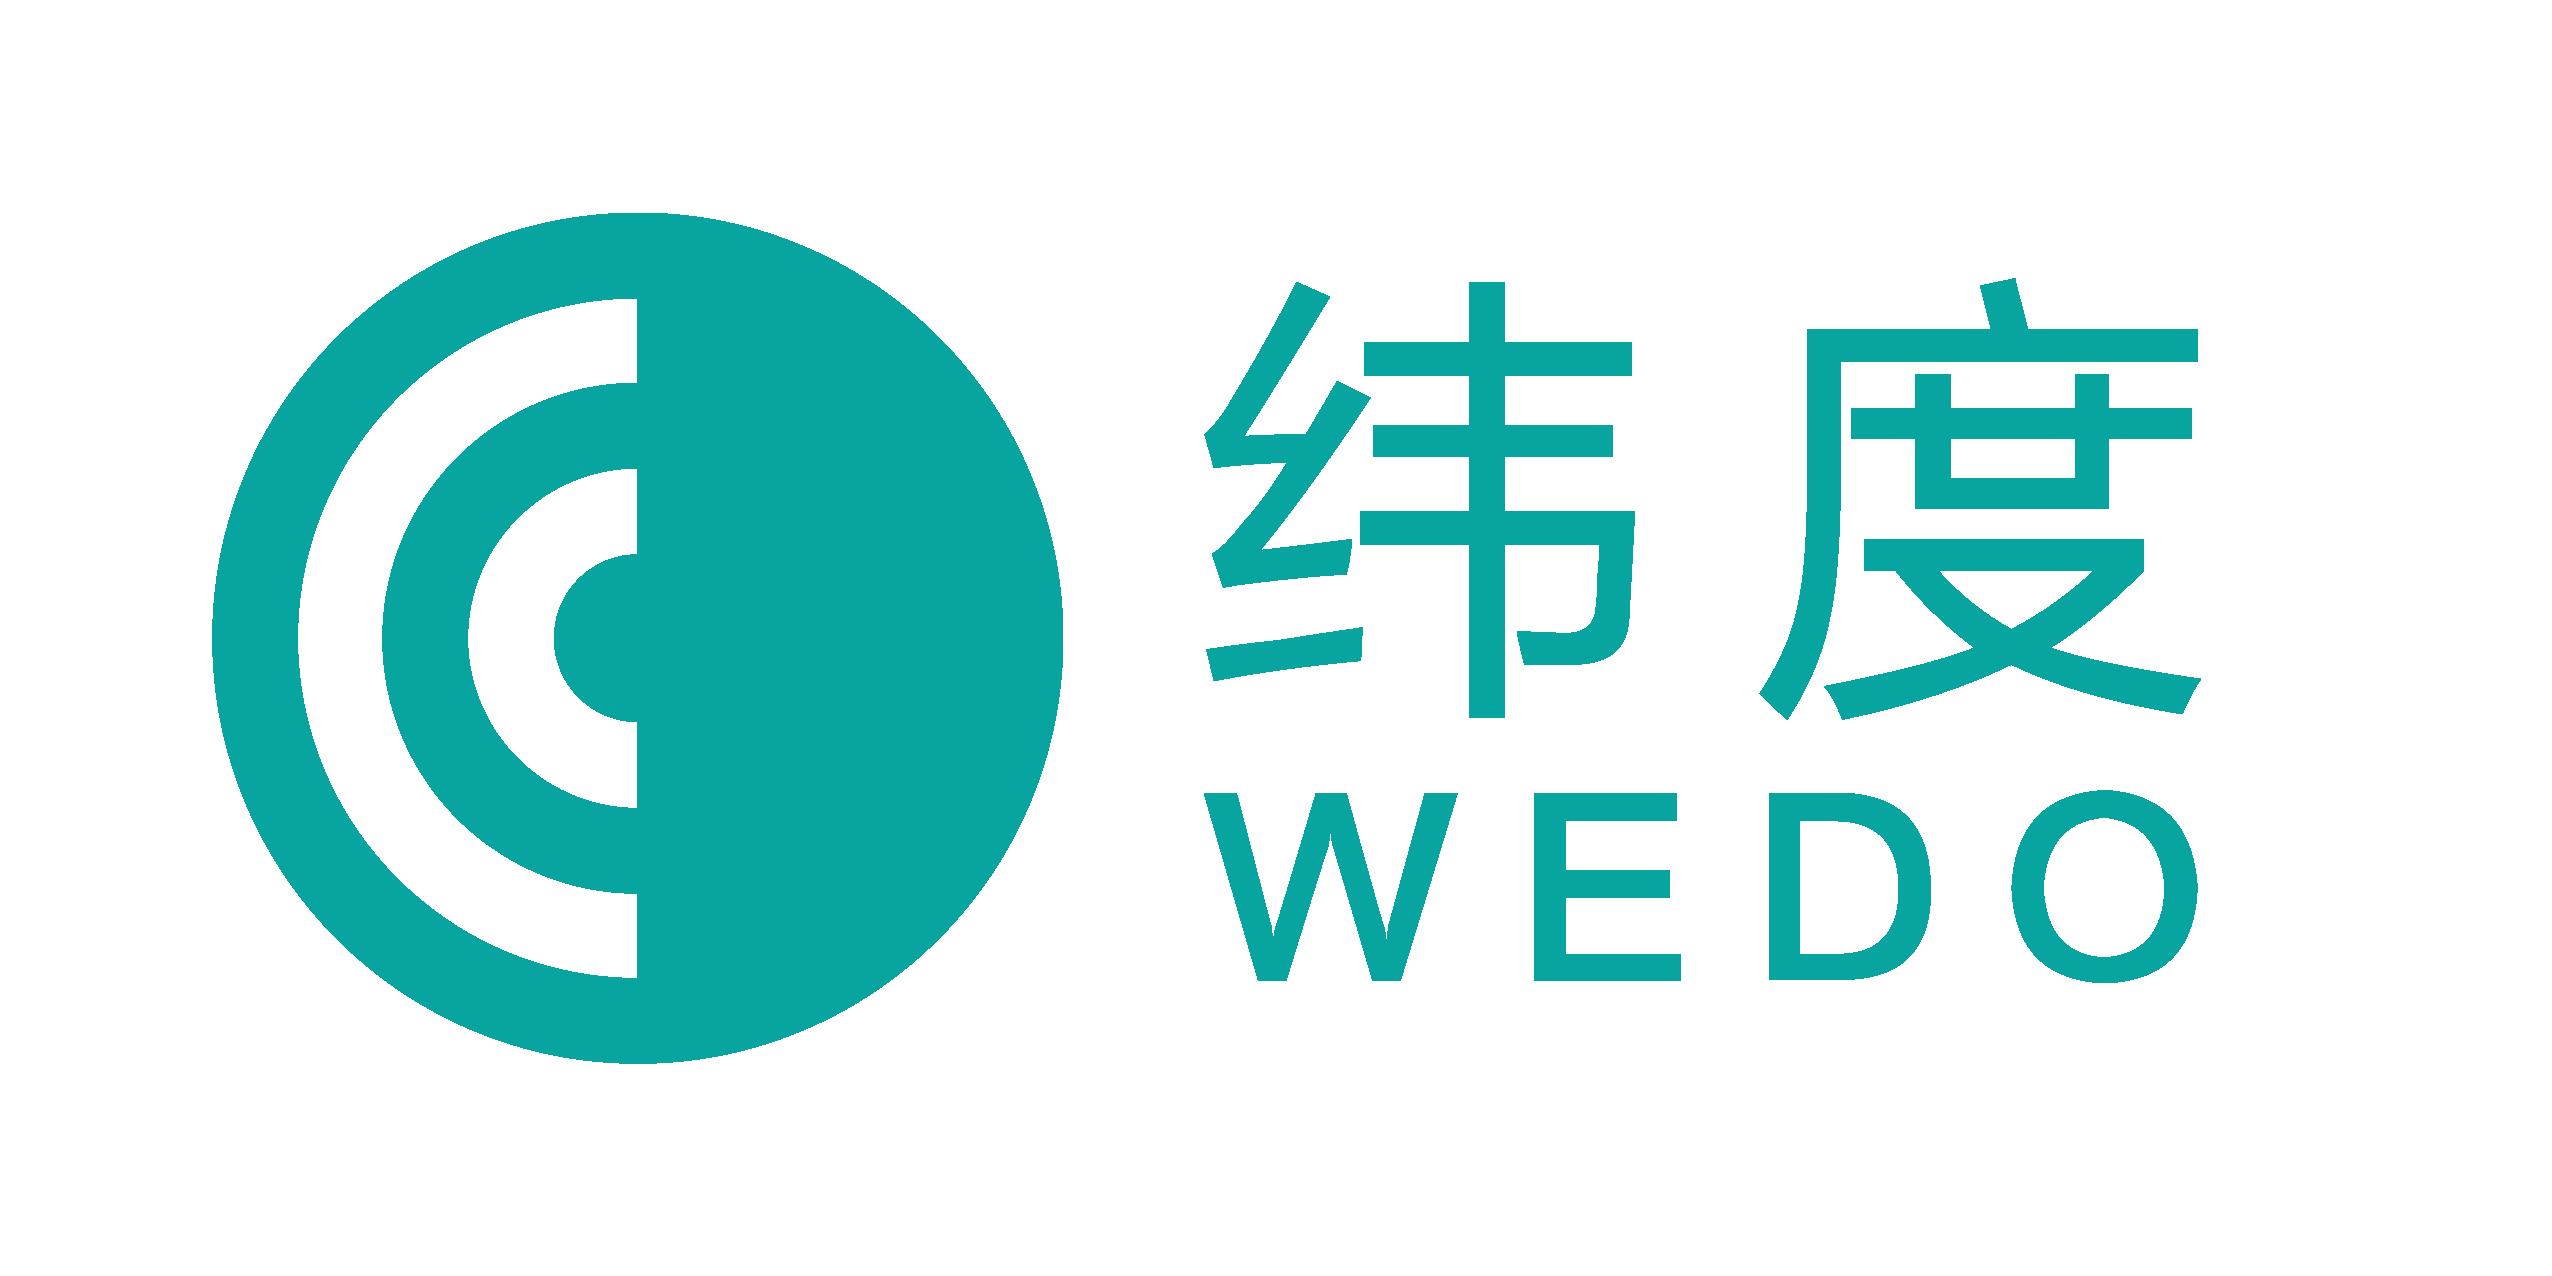 WEDO文化 古语云:天有极,人无经纬。 纬度(WEDO)团队要做的,就是向着无限的潜力去发掘和挑战! WEDO历史 校内网渠道团队成立于2006年3月,正式命名为WEDO团队于2007年7月。通过我们WEDO团队的不懈努力,至今已经成功拓展25000000大学生用户,100000海外用户。700000高中用户。 WEDO团队使命: 与中国最大规模的大学生和高中生进行直面沟通,培养互联网2.